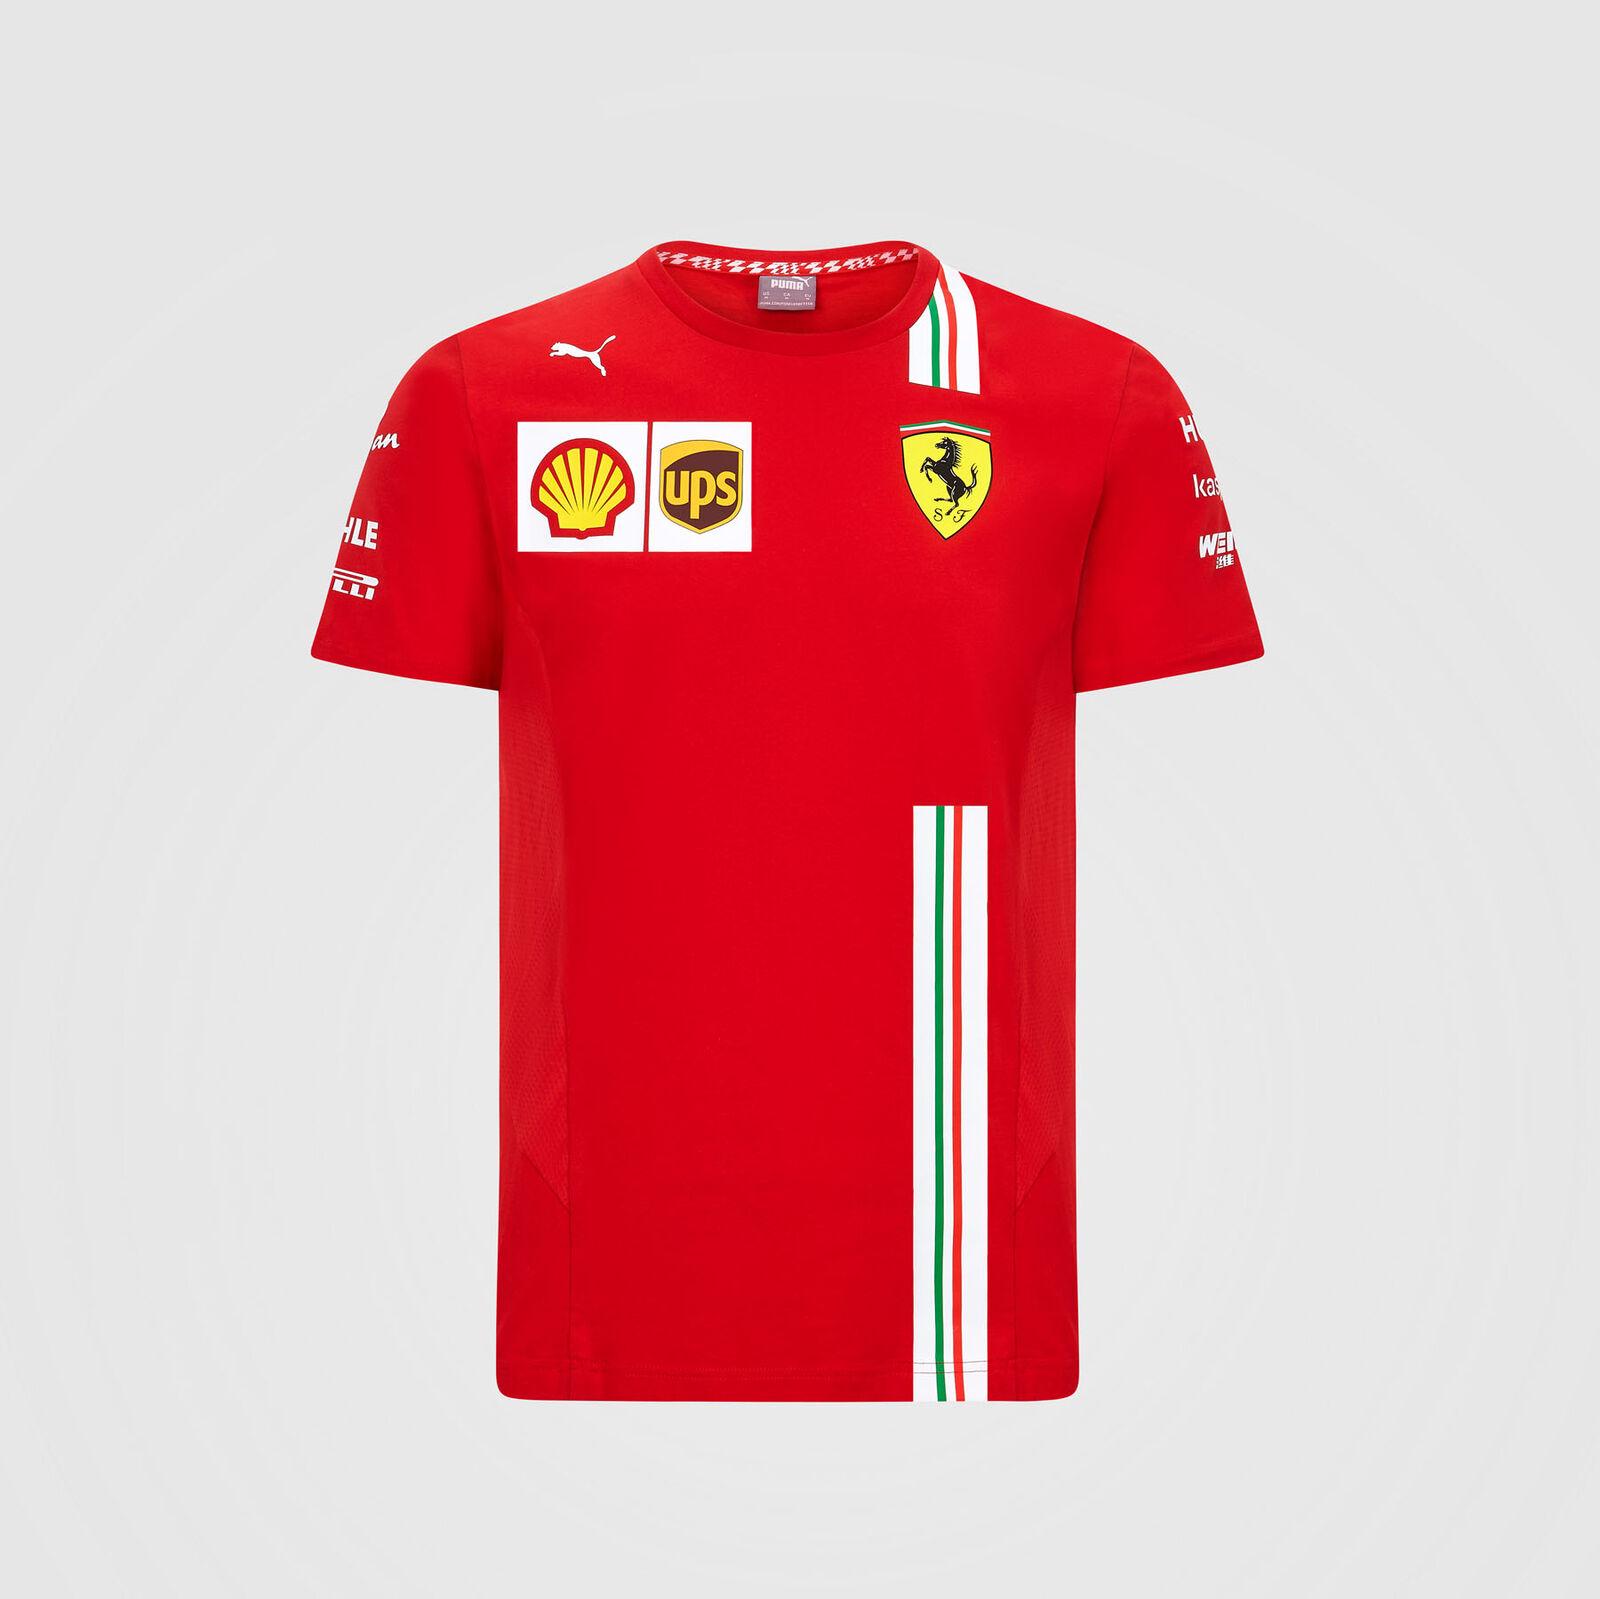 New Red Formula 1 F1 Fanatics Scuderia Ferrari Kid/'s T-Shirt